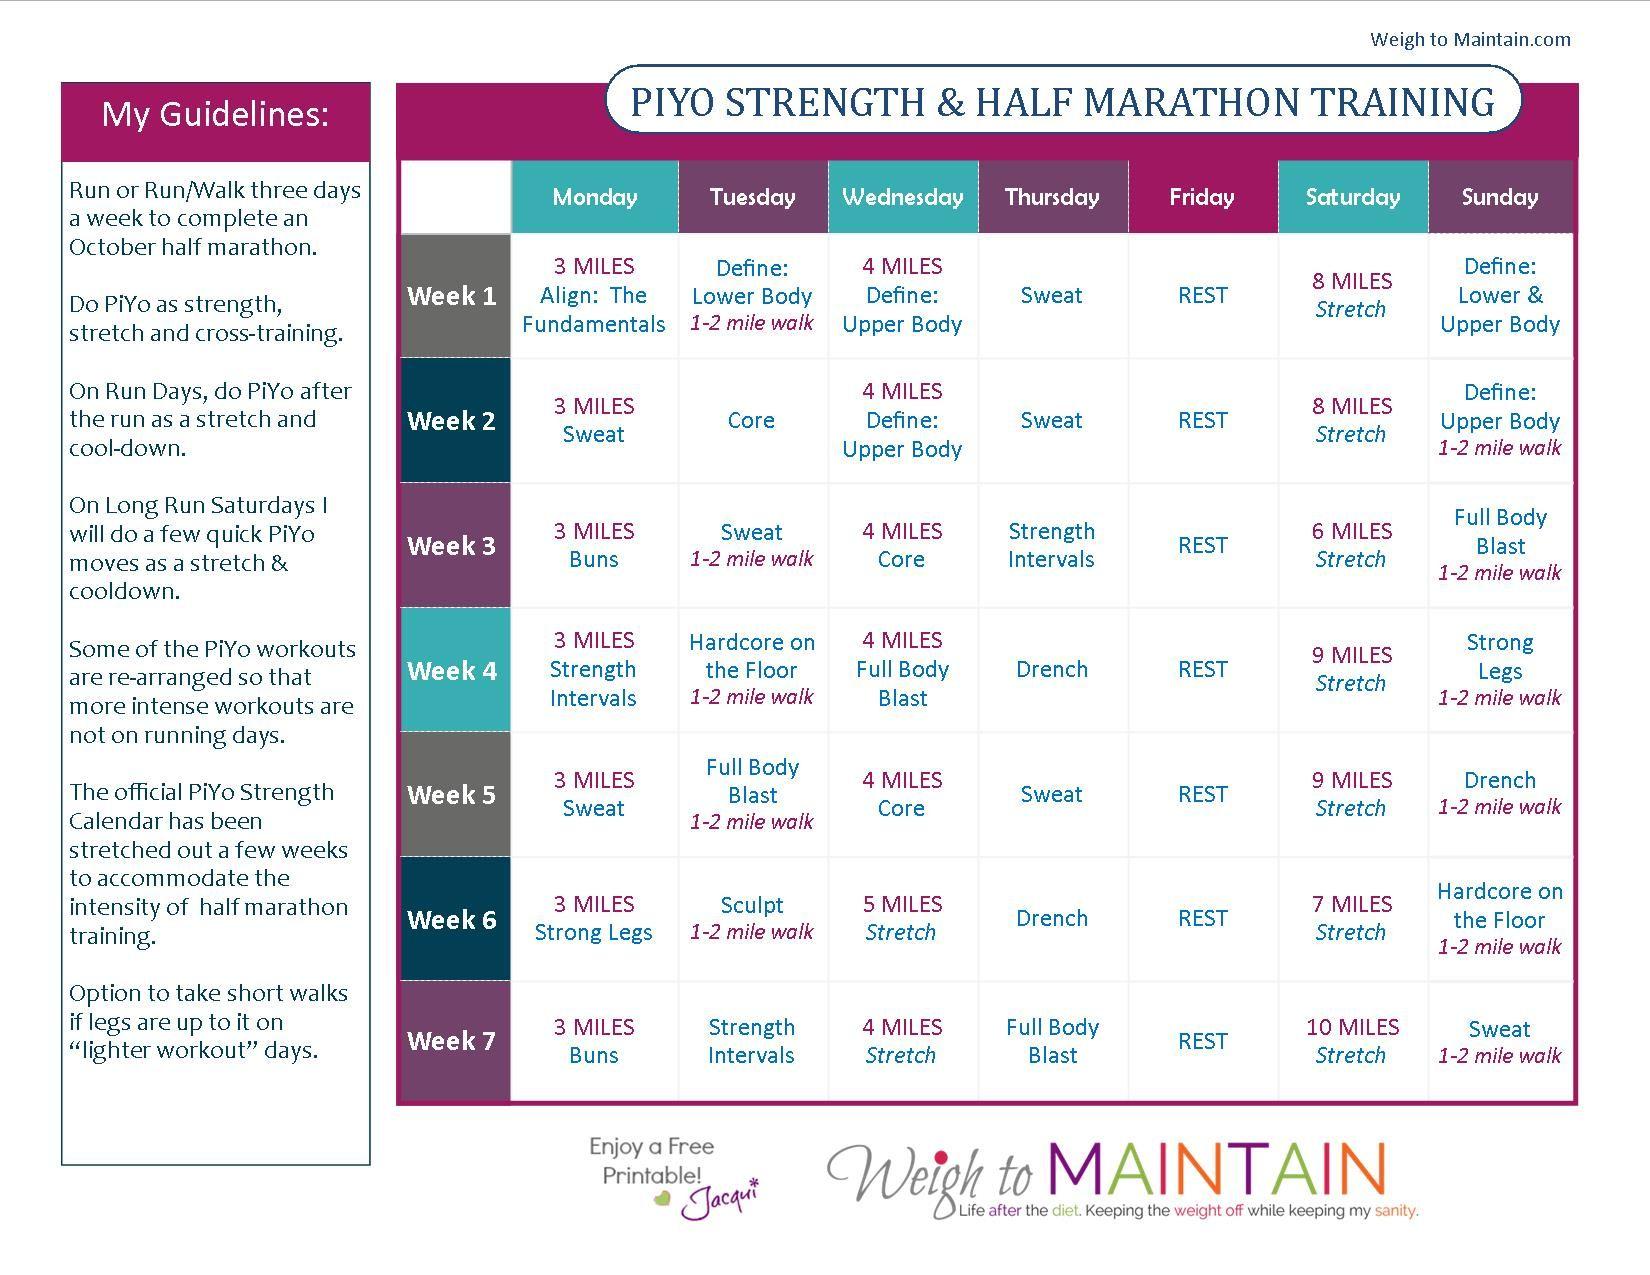 Piyo And Half Marathon Training  Health  Fitness